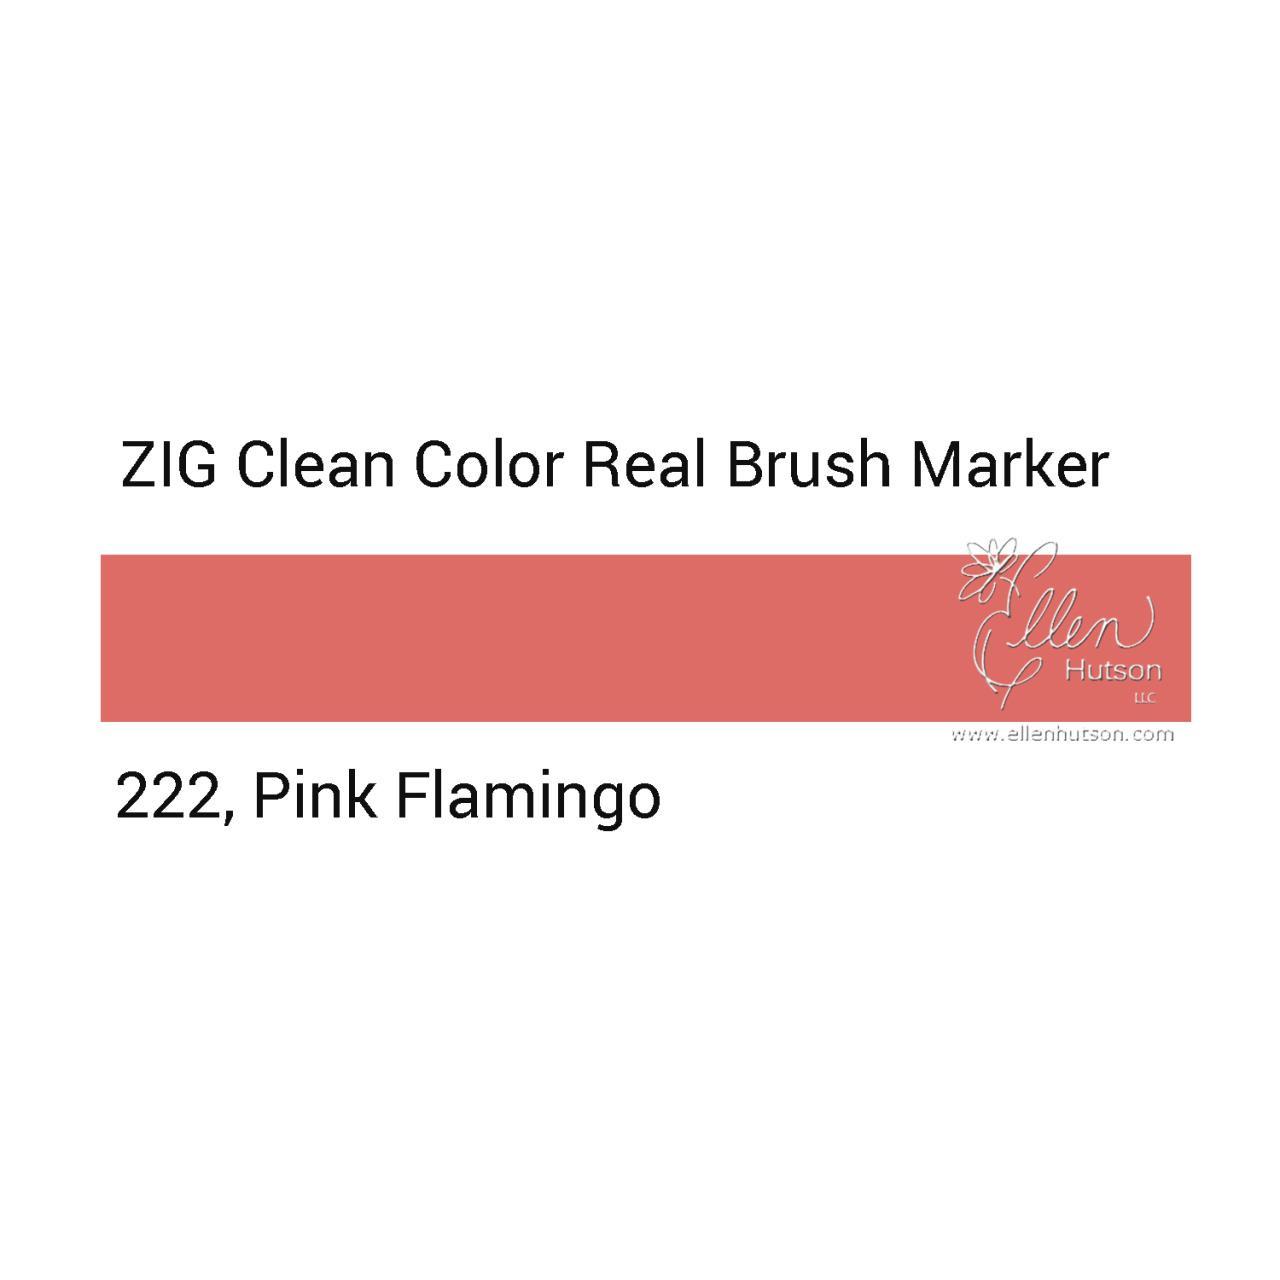 222 - Pink Flamingo, ZIG Clean Color Real Brush Marker -